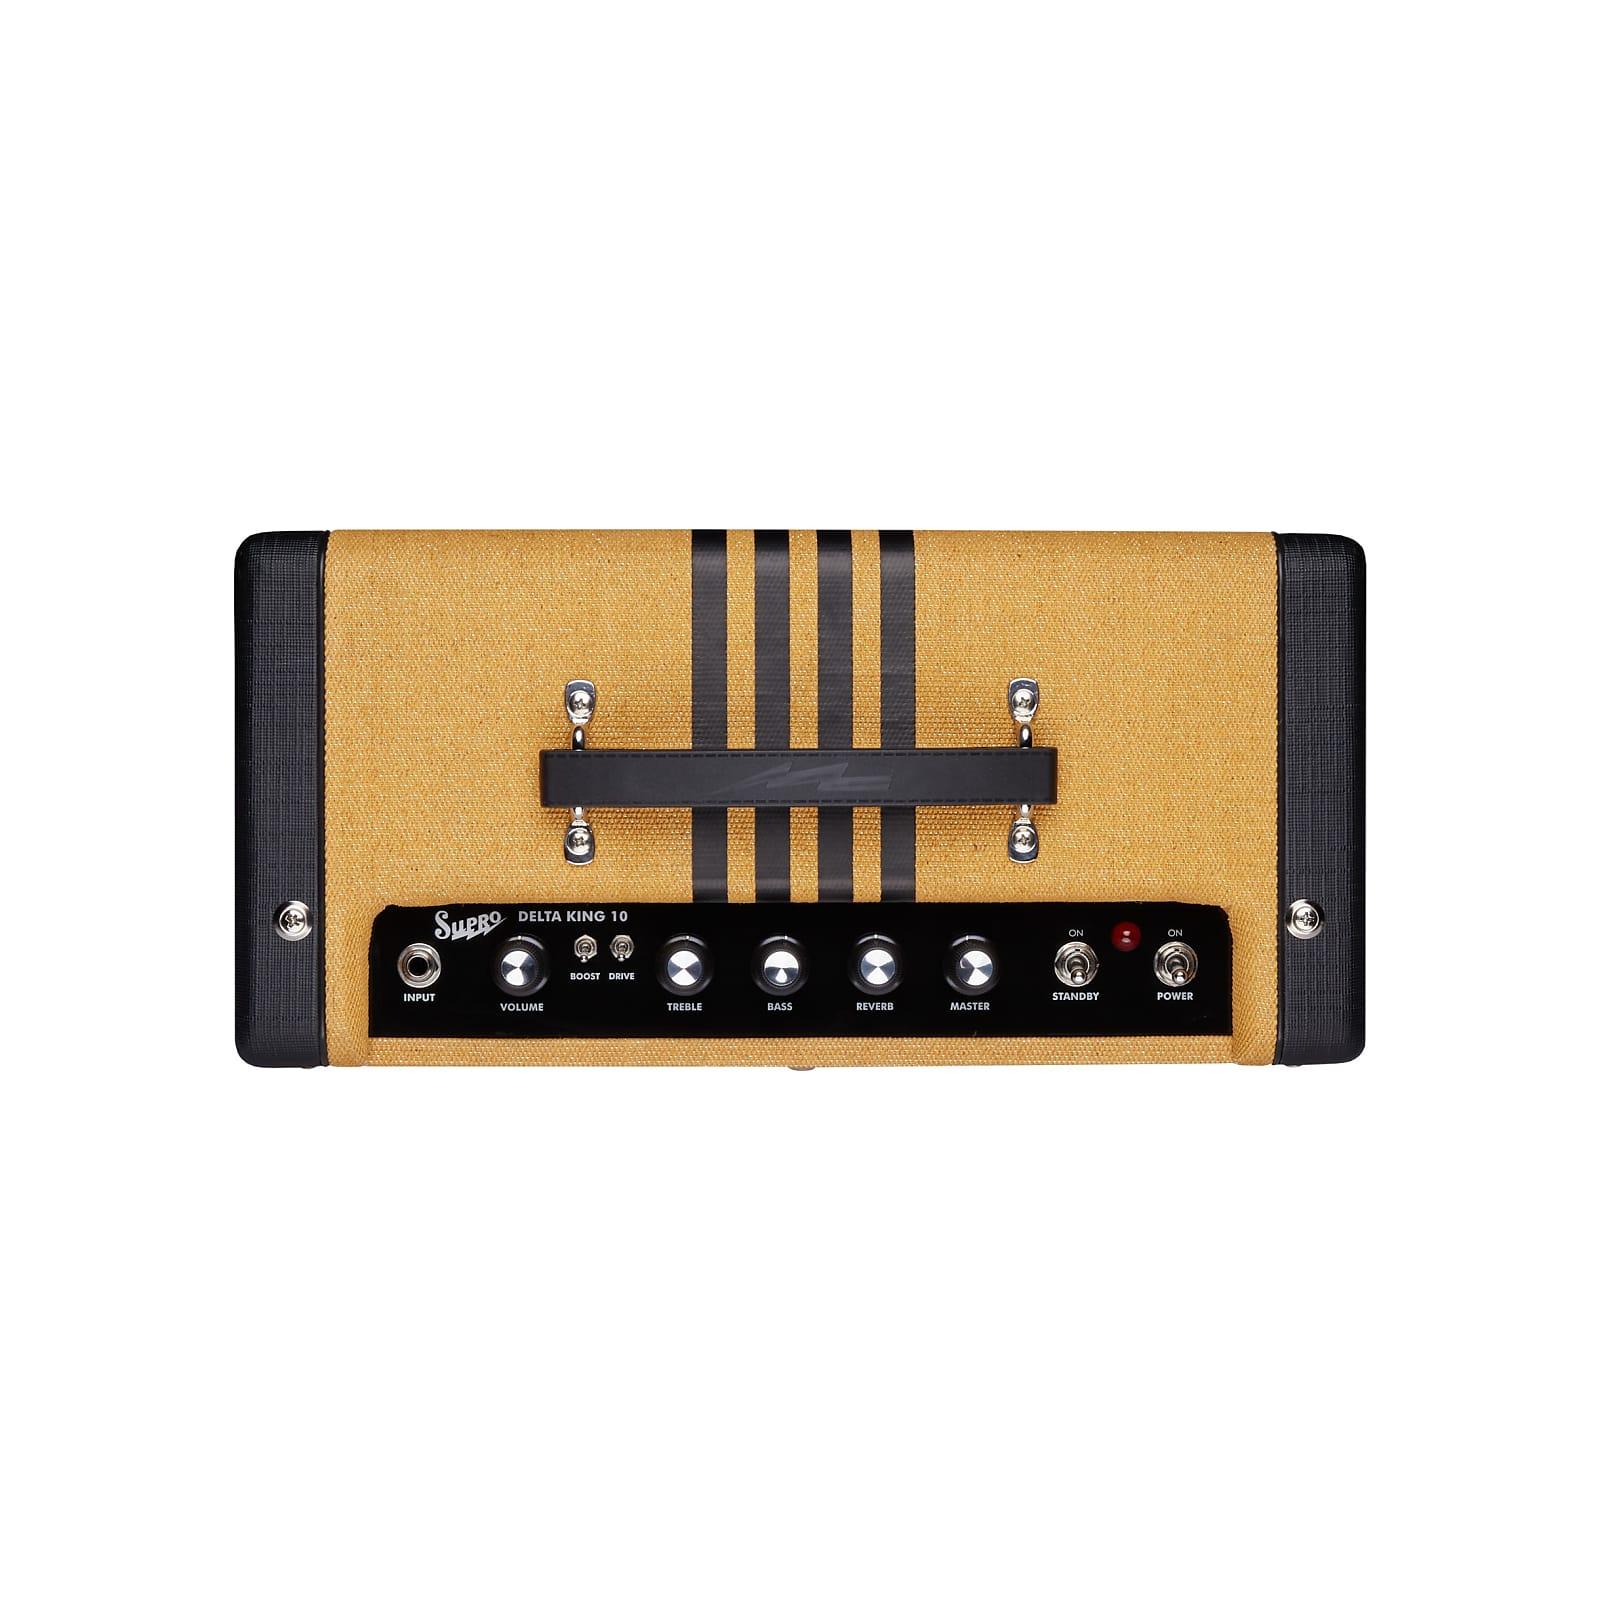 Supro 1820RTB Delta King 10 5W 1x10'' Guitar Tube Combo Amplifier Tweed & Black